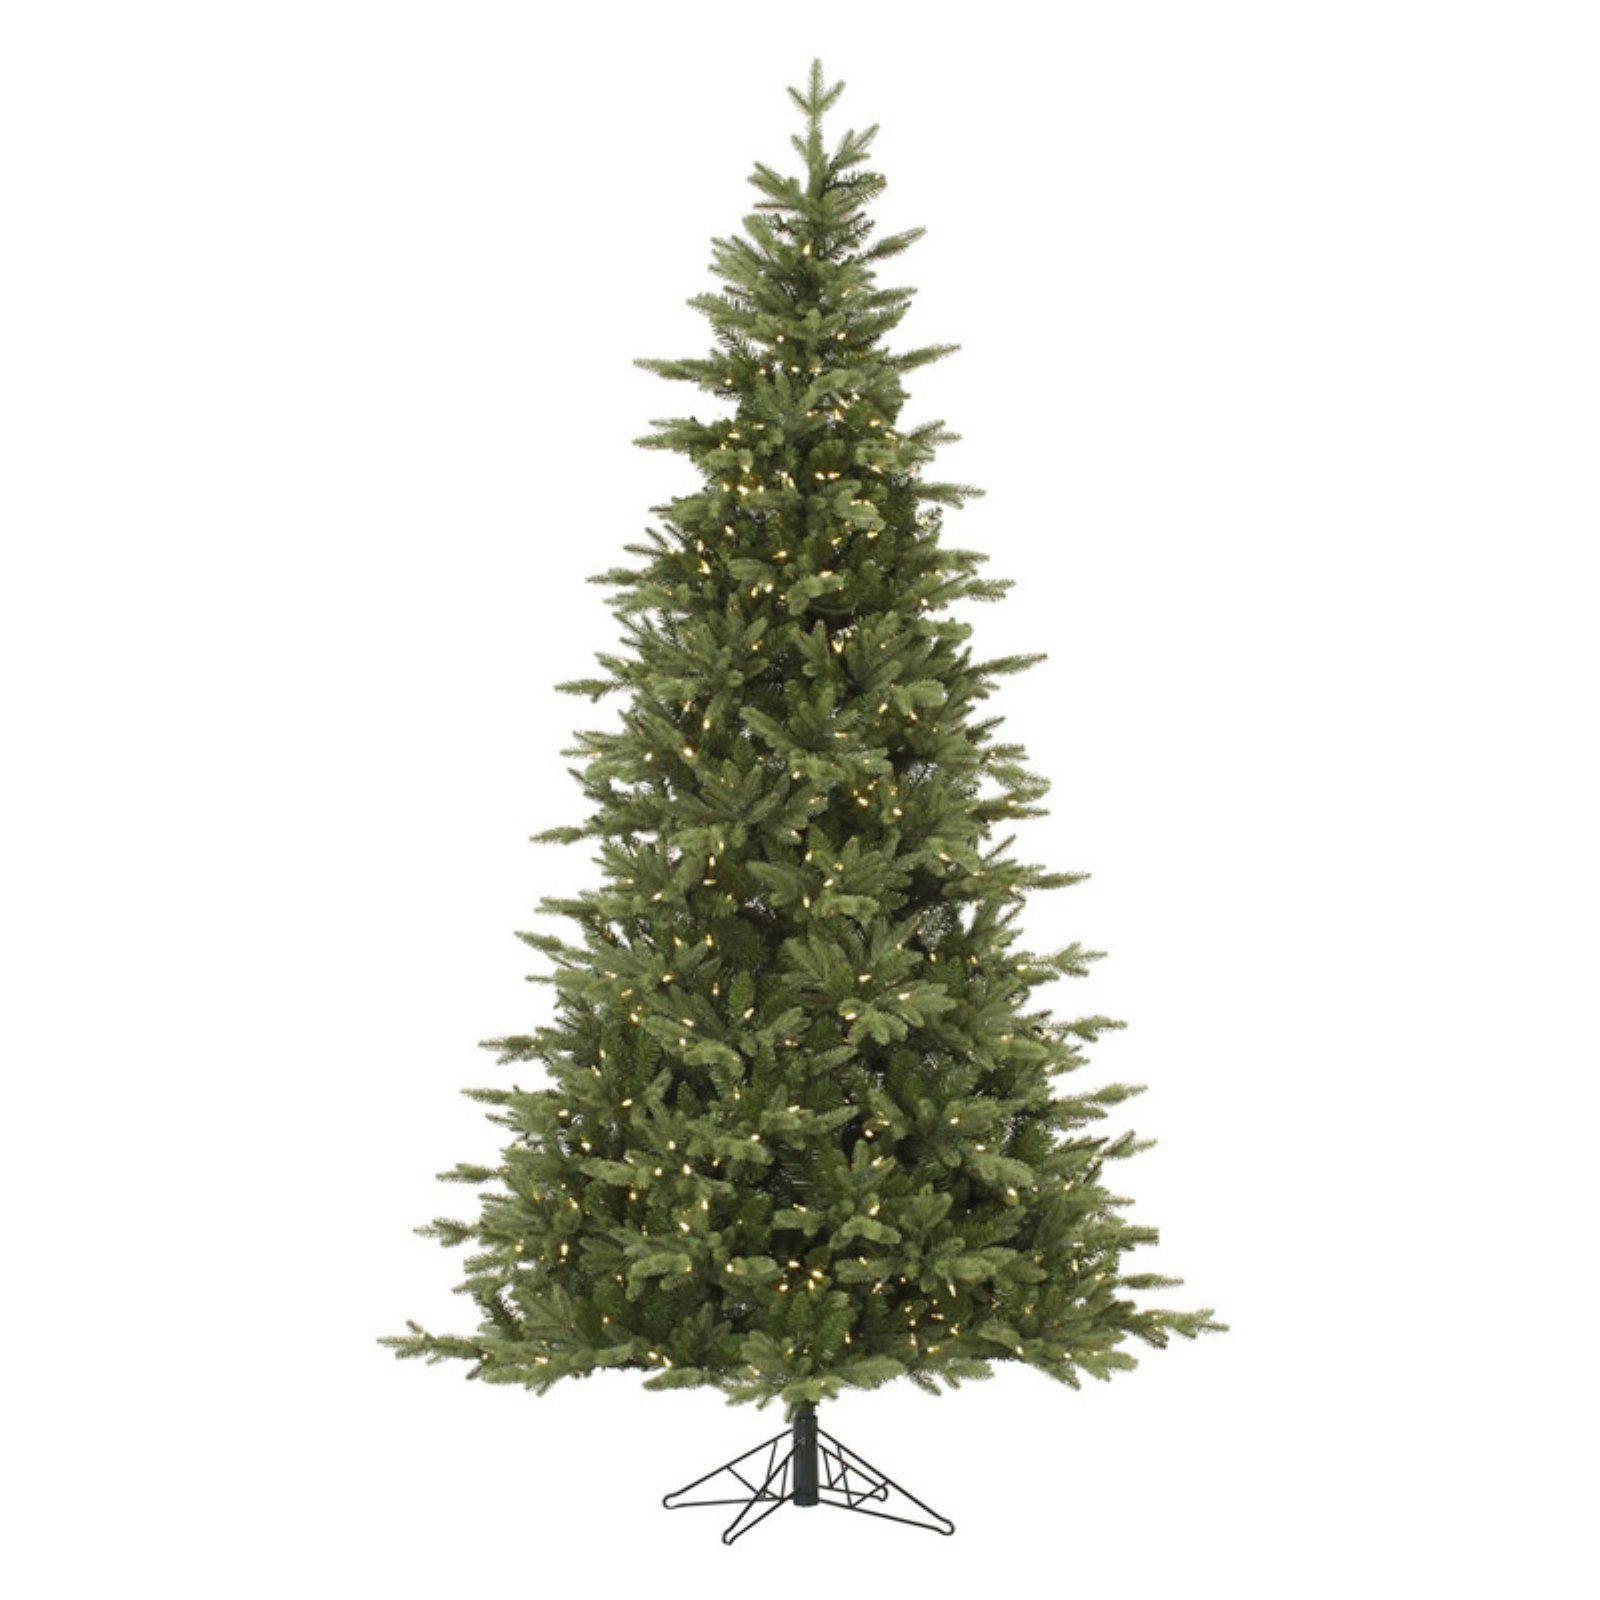 12 Ft Vickerman Fresh Balsam Fir Full Pre Lit Christmas Tree Unlit Christmas Trees Pre Lit Christmas Tree Balsam Fir Christmas Tree